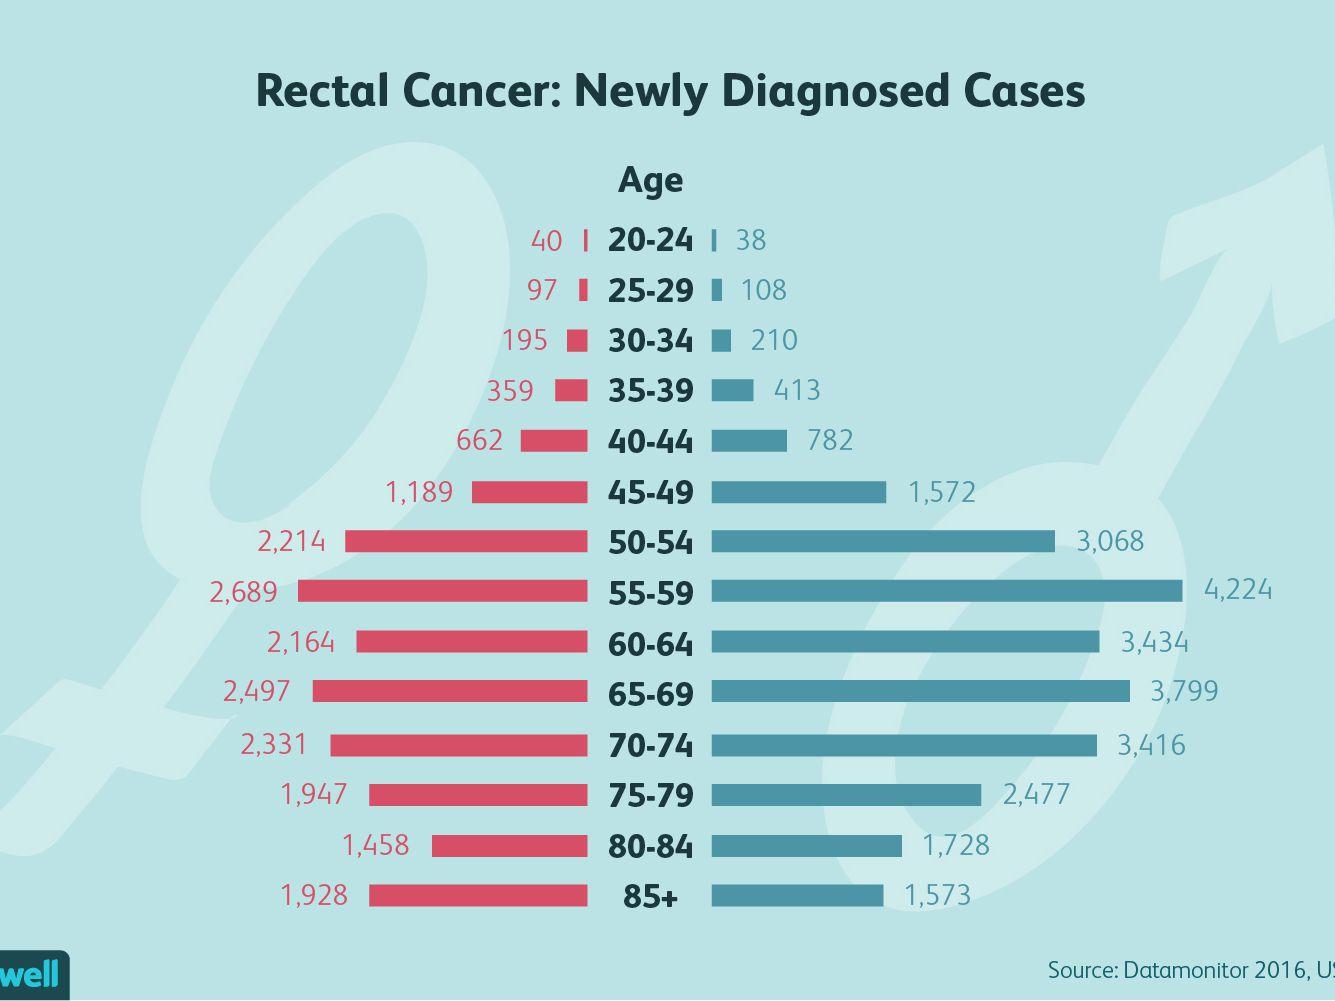 colorectal cancer etiology